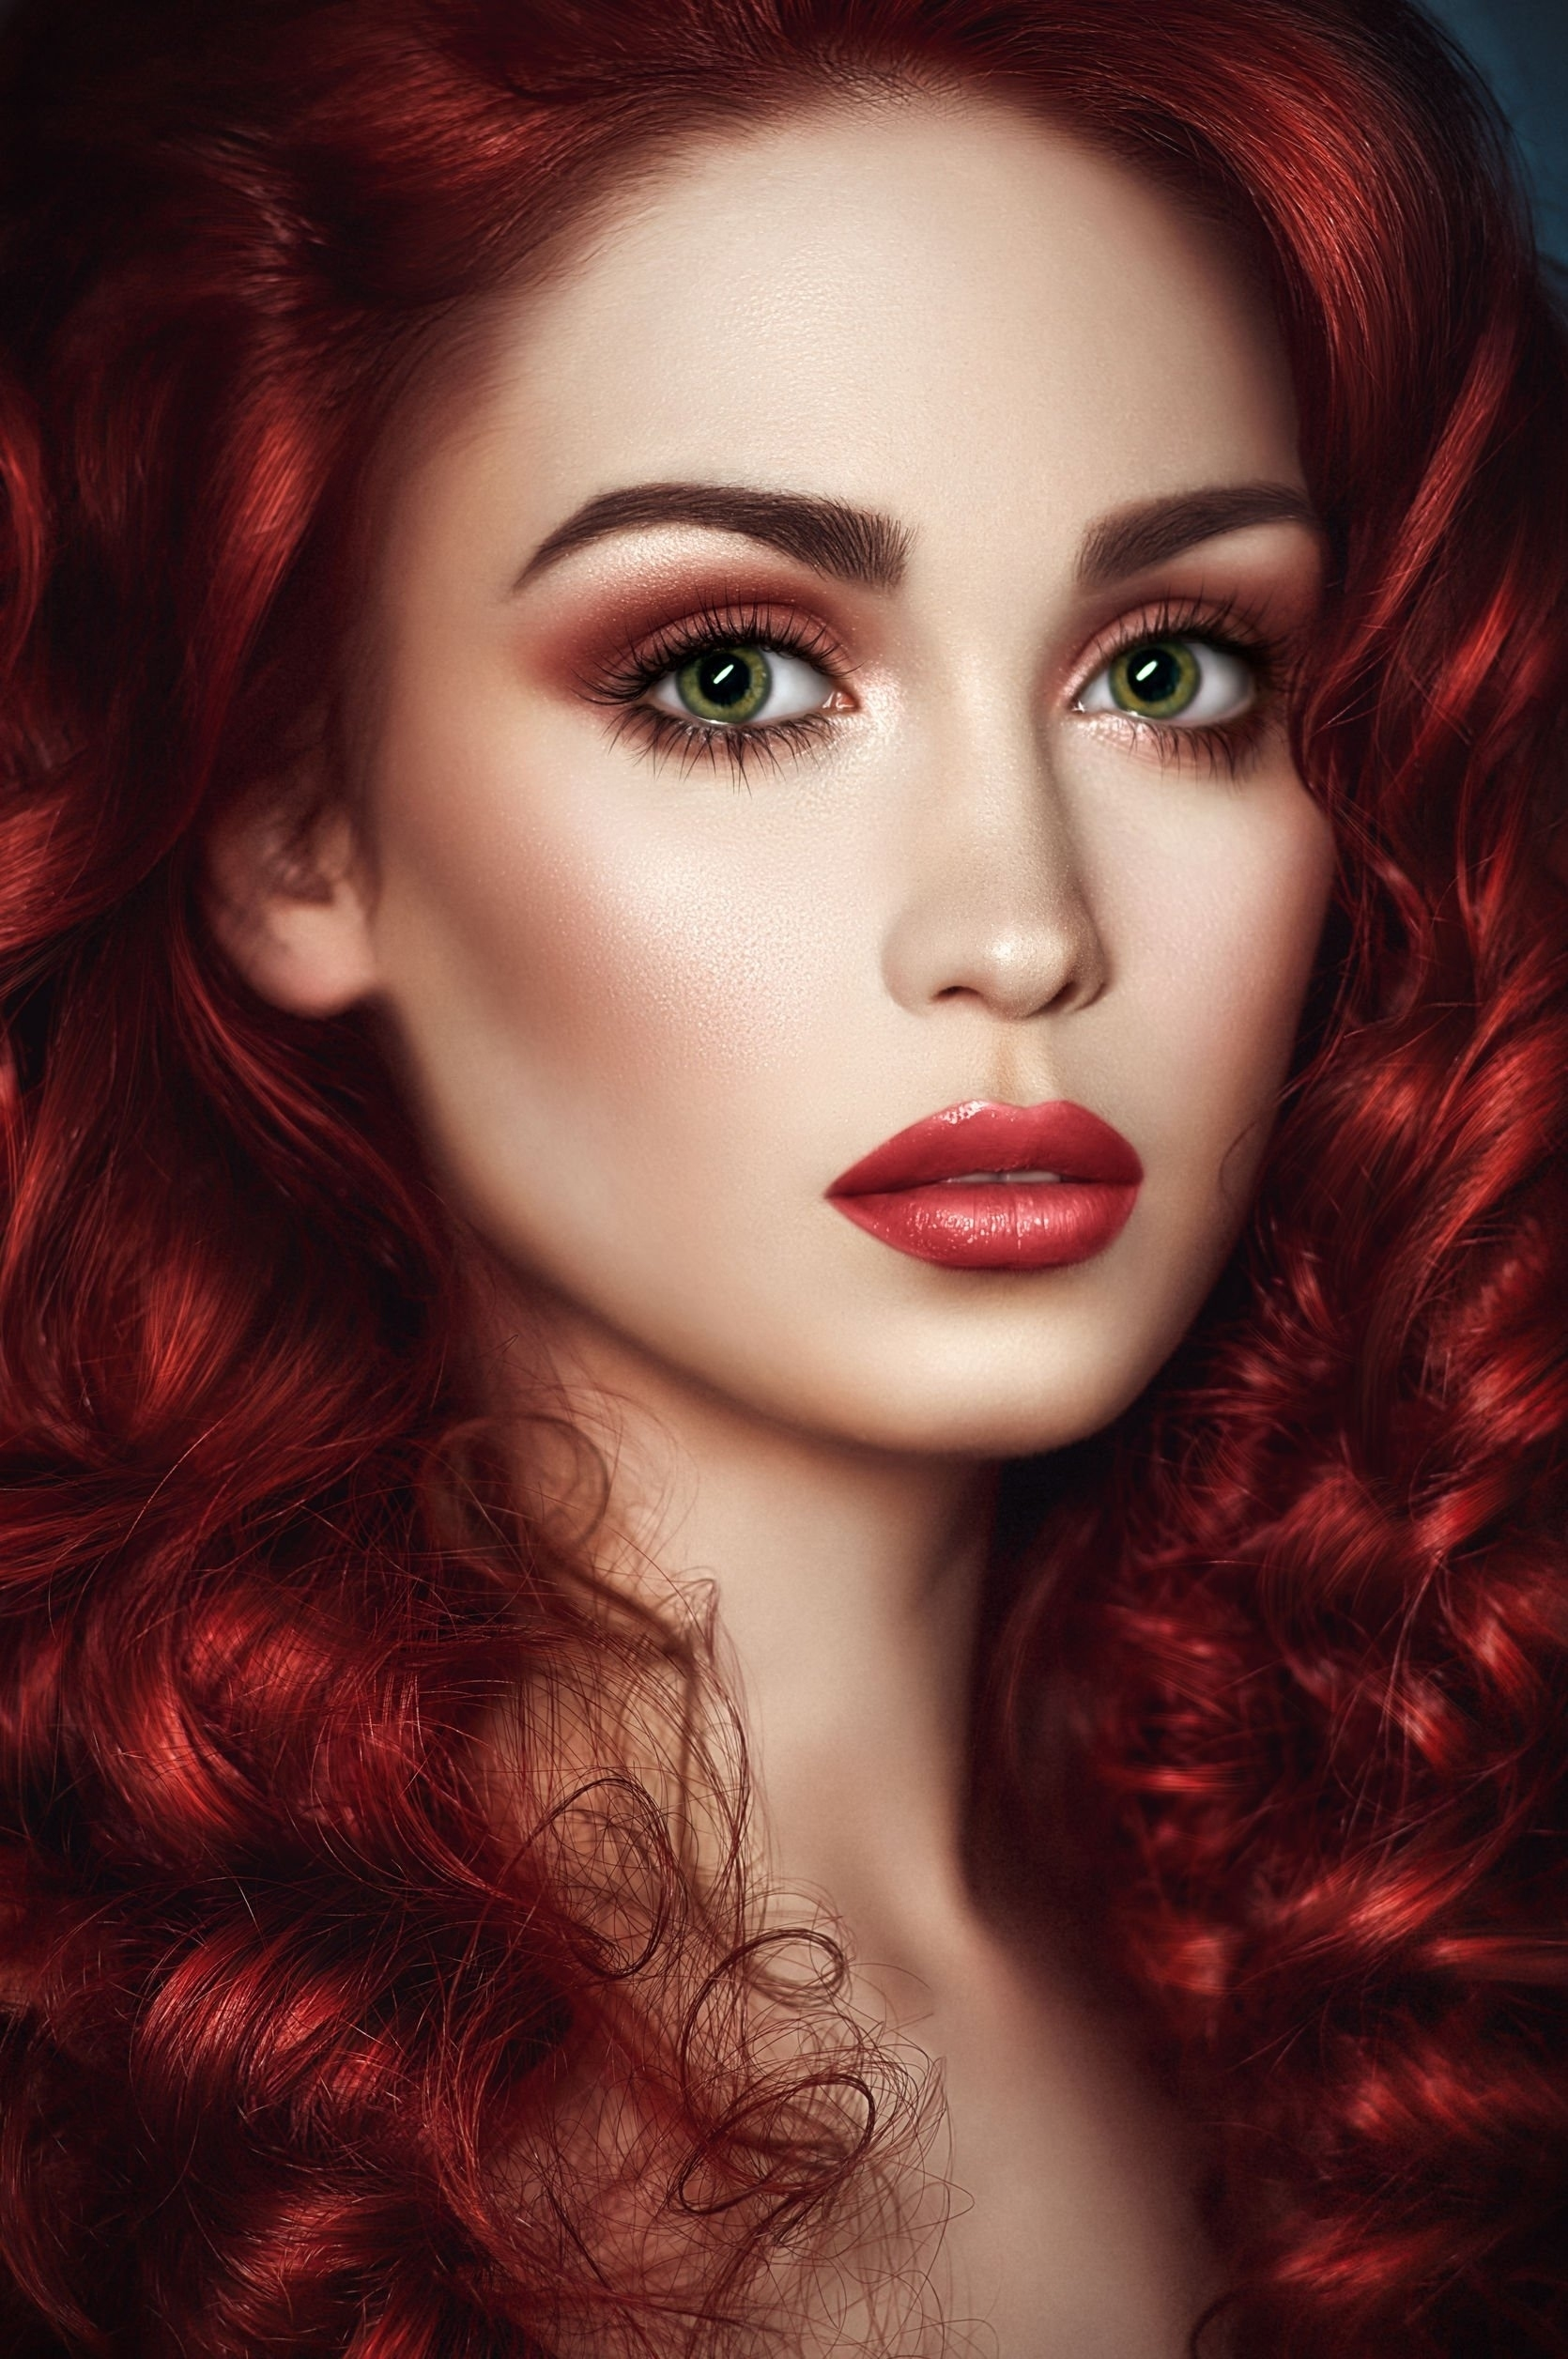 Dark Red Hair Green Eyes Makeup | Saubhaya Makeup in Makeup For Green Eyes And Dark Red Hair